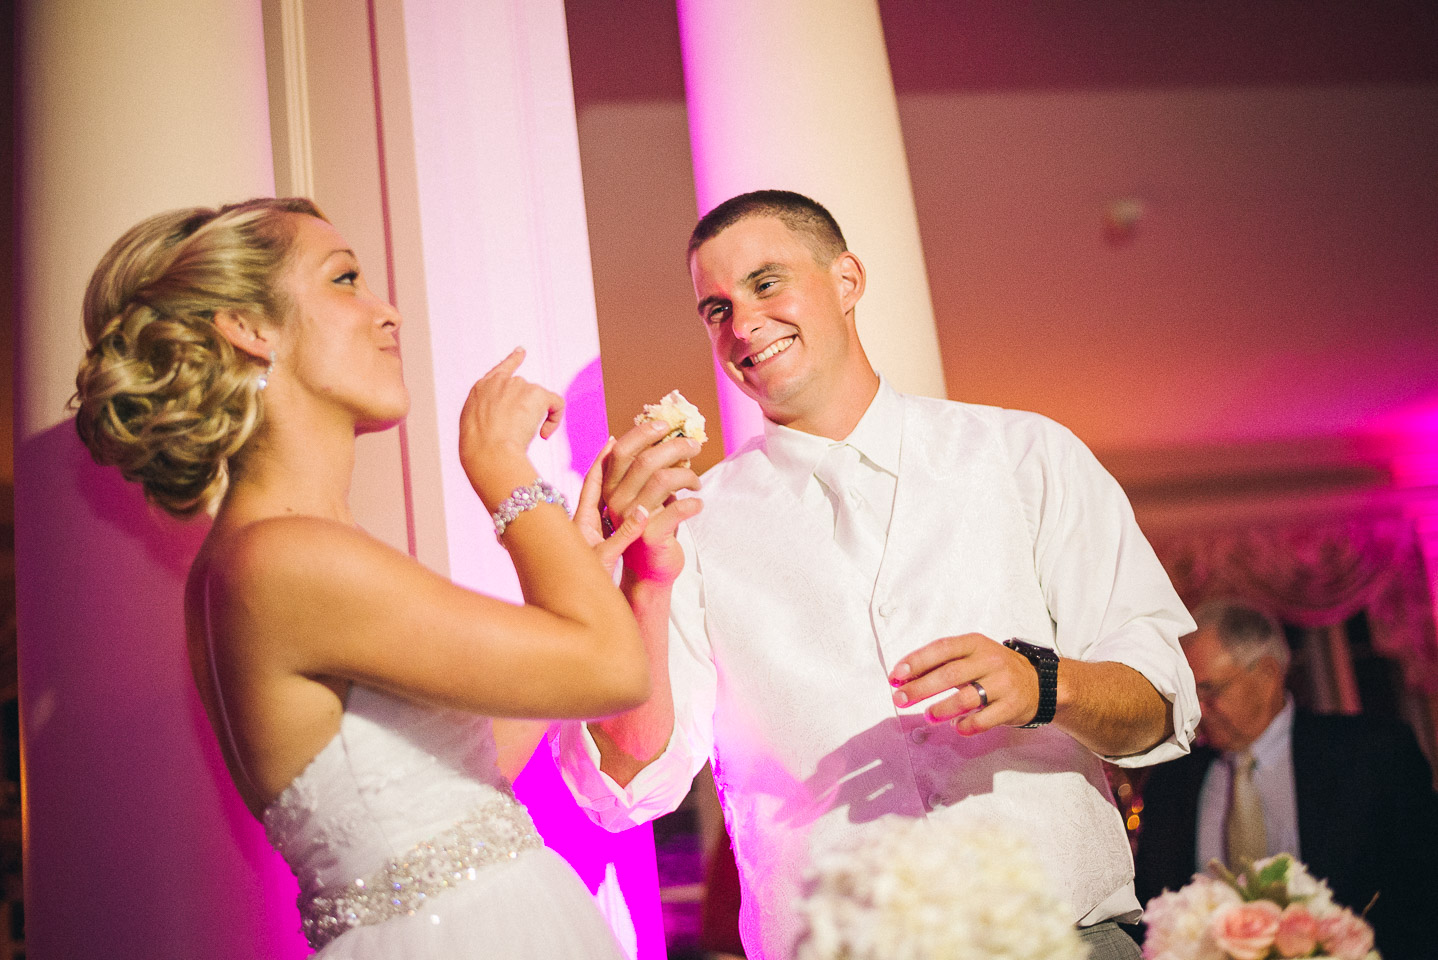 NH Wedding Photographer: cake cutting feed